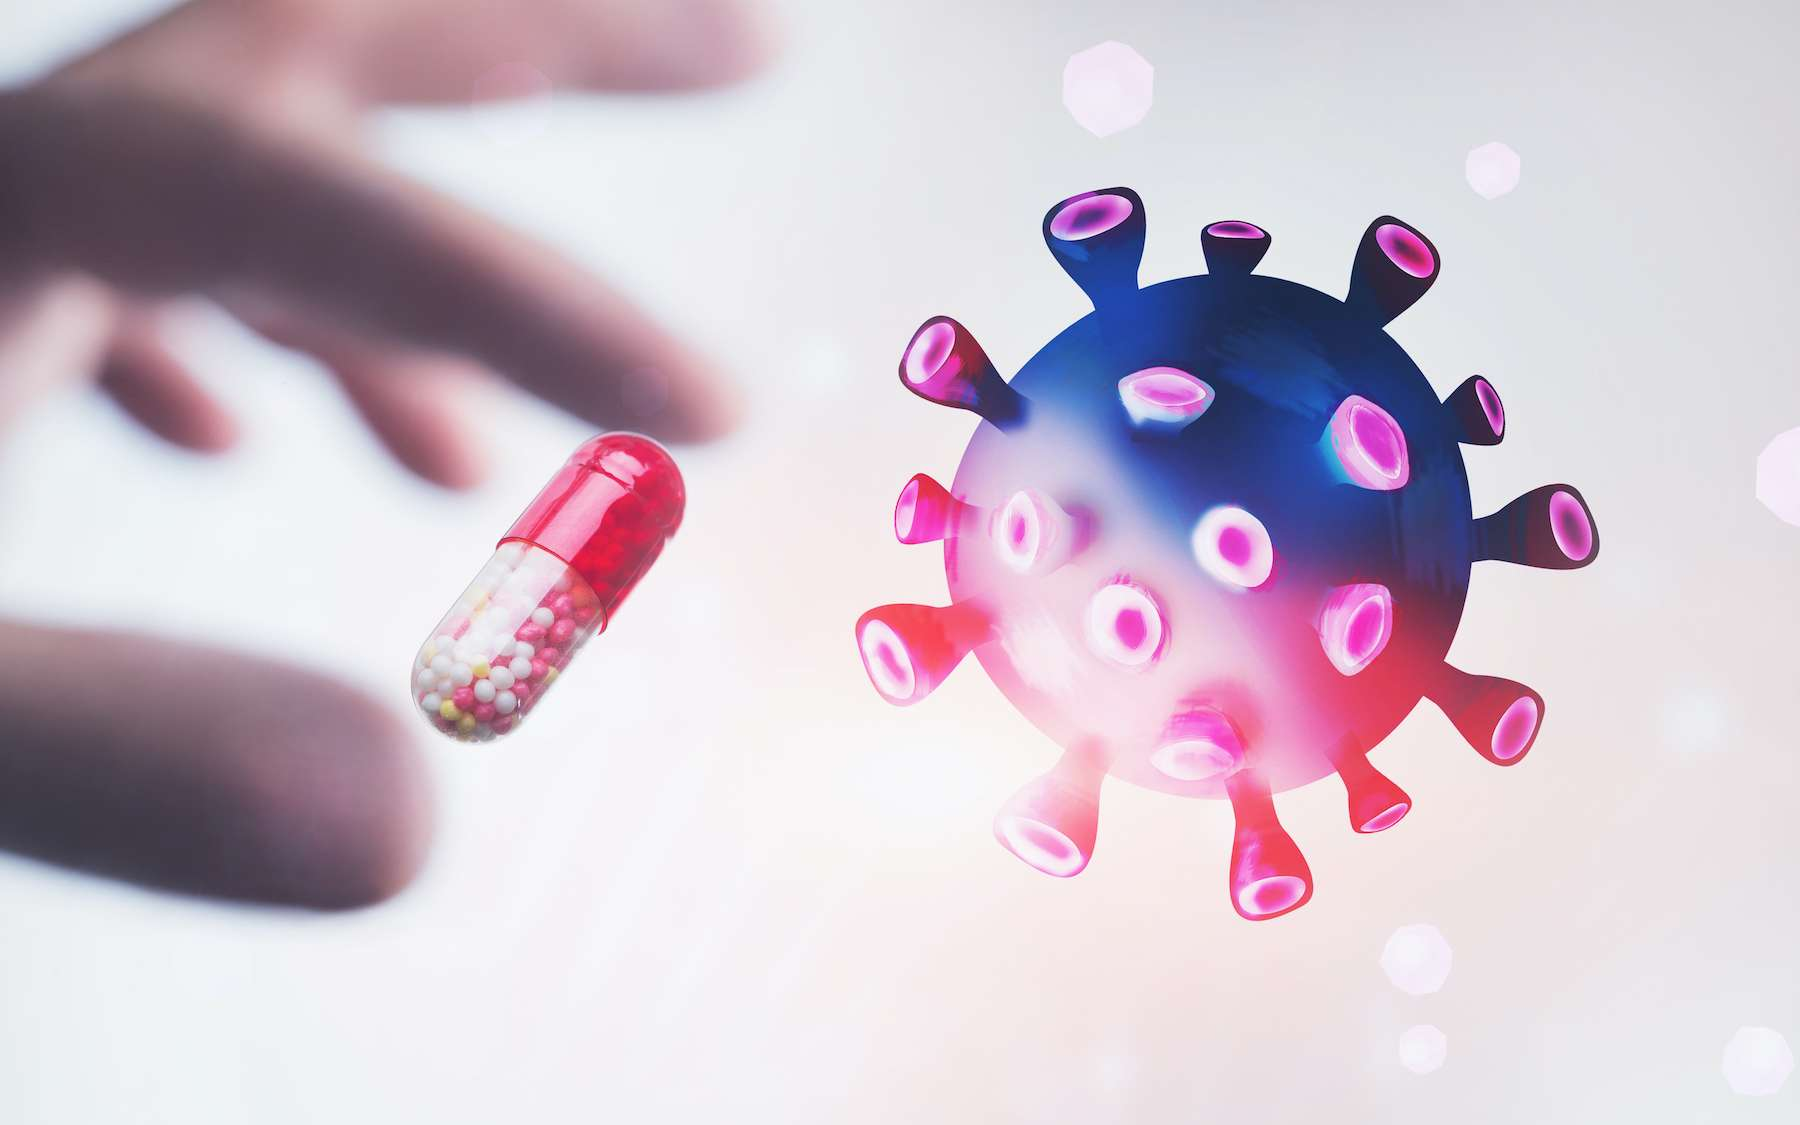 Révolution mondiale : Israël lance le premier vaccin oral anti-covid-19